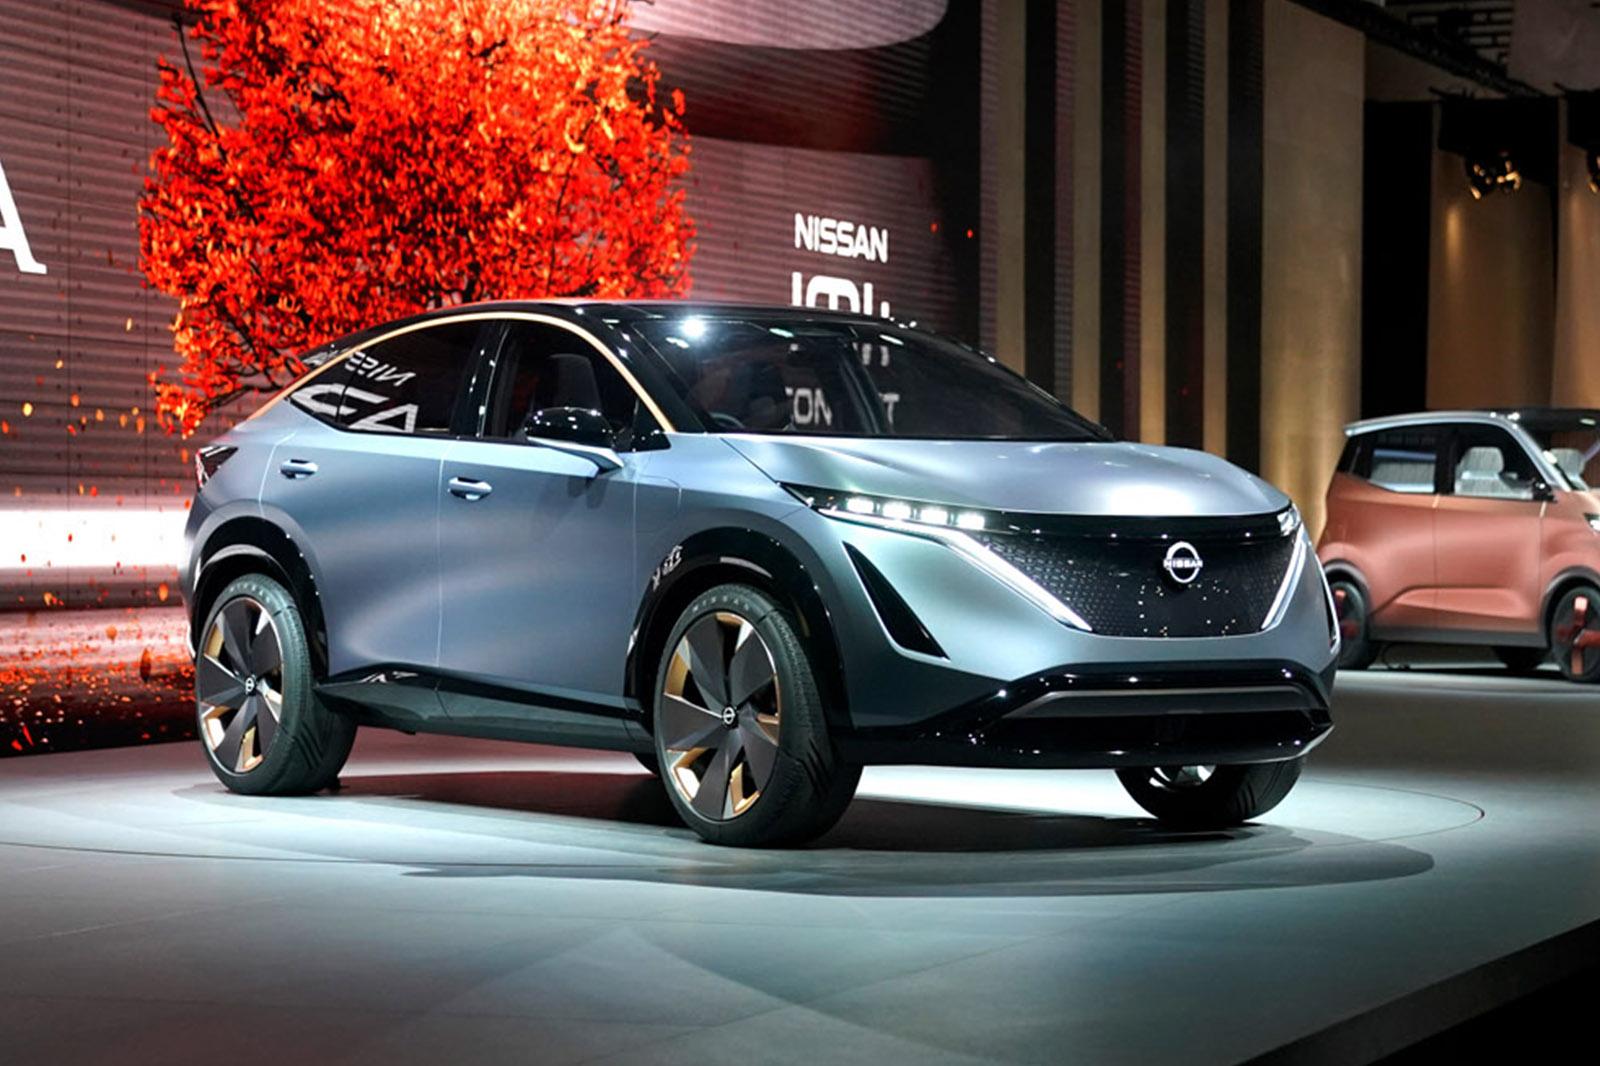 Bold New Nissan Ariya Is Pivotal Electric Suv With 310 Mile Range Autocar